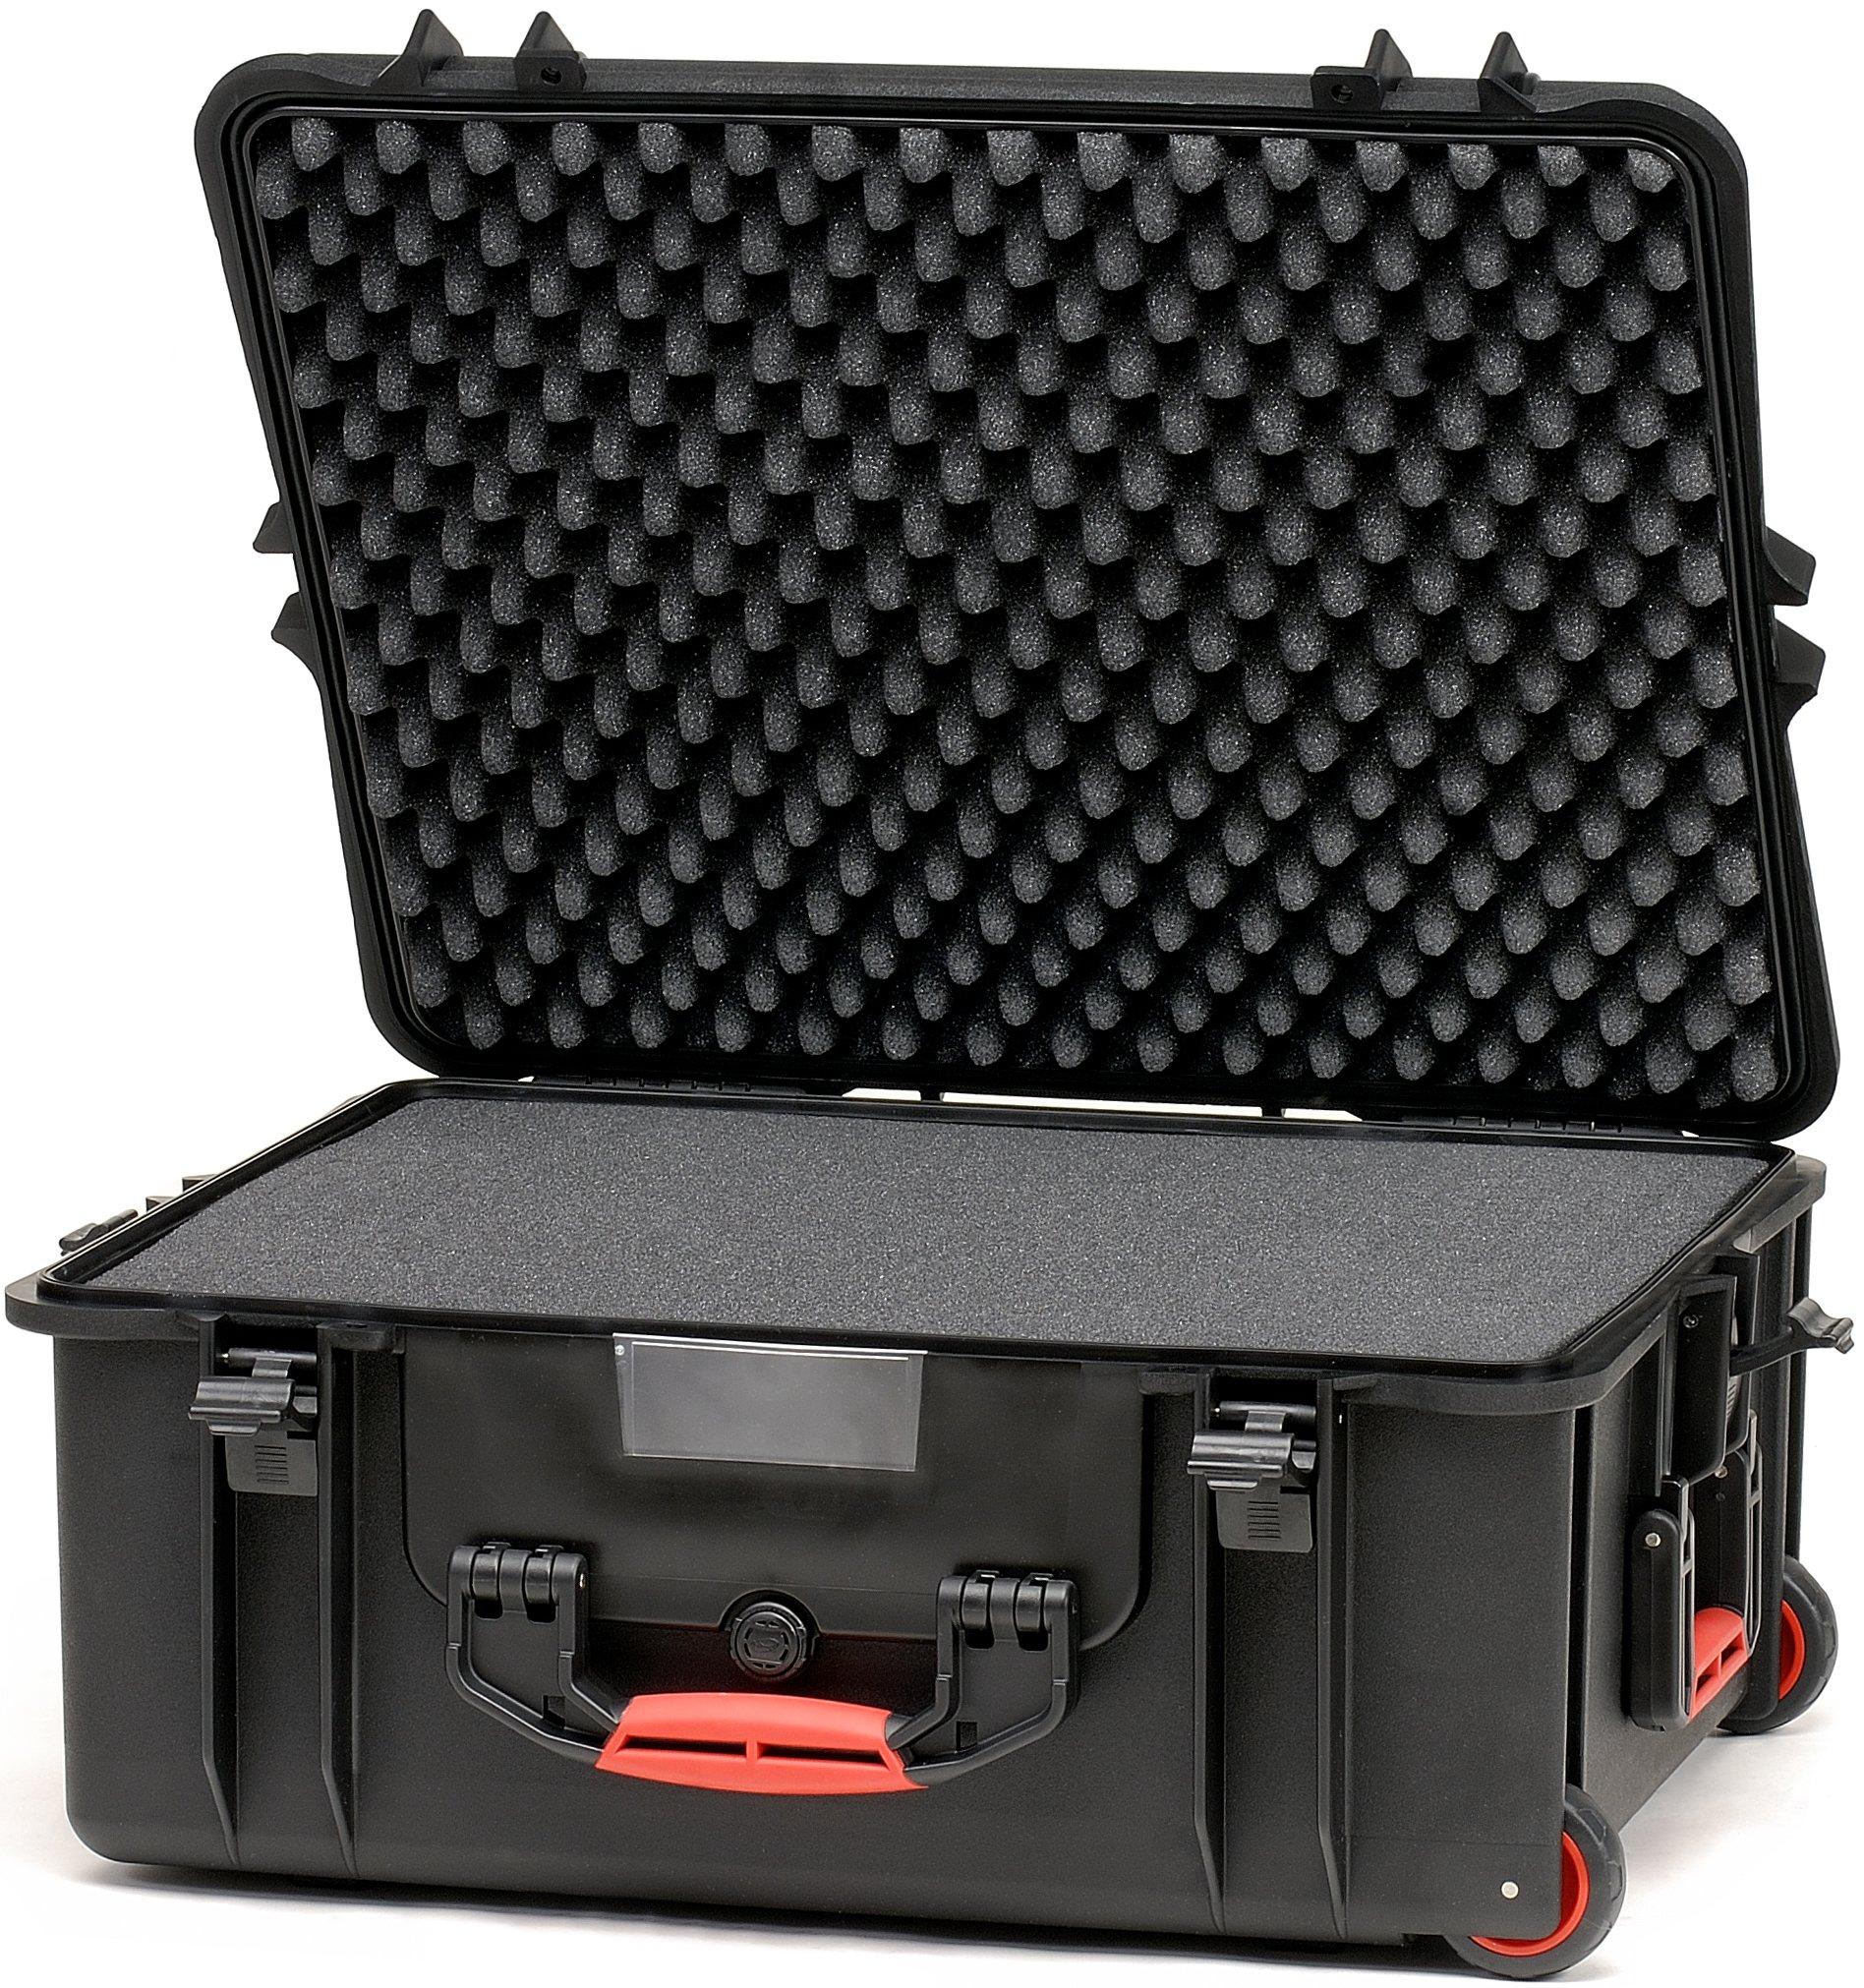 HPRC 2700W Case